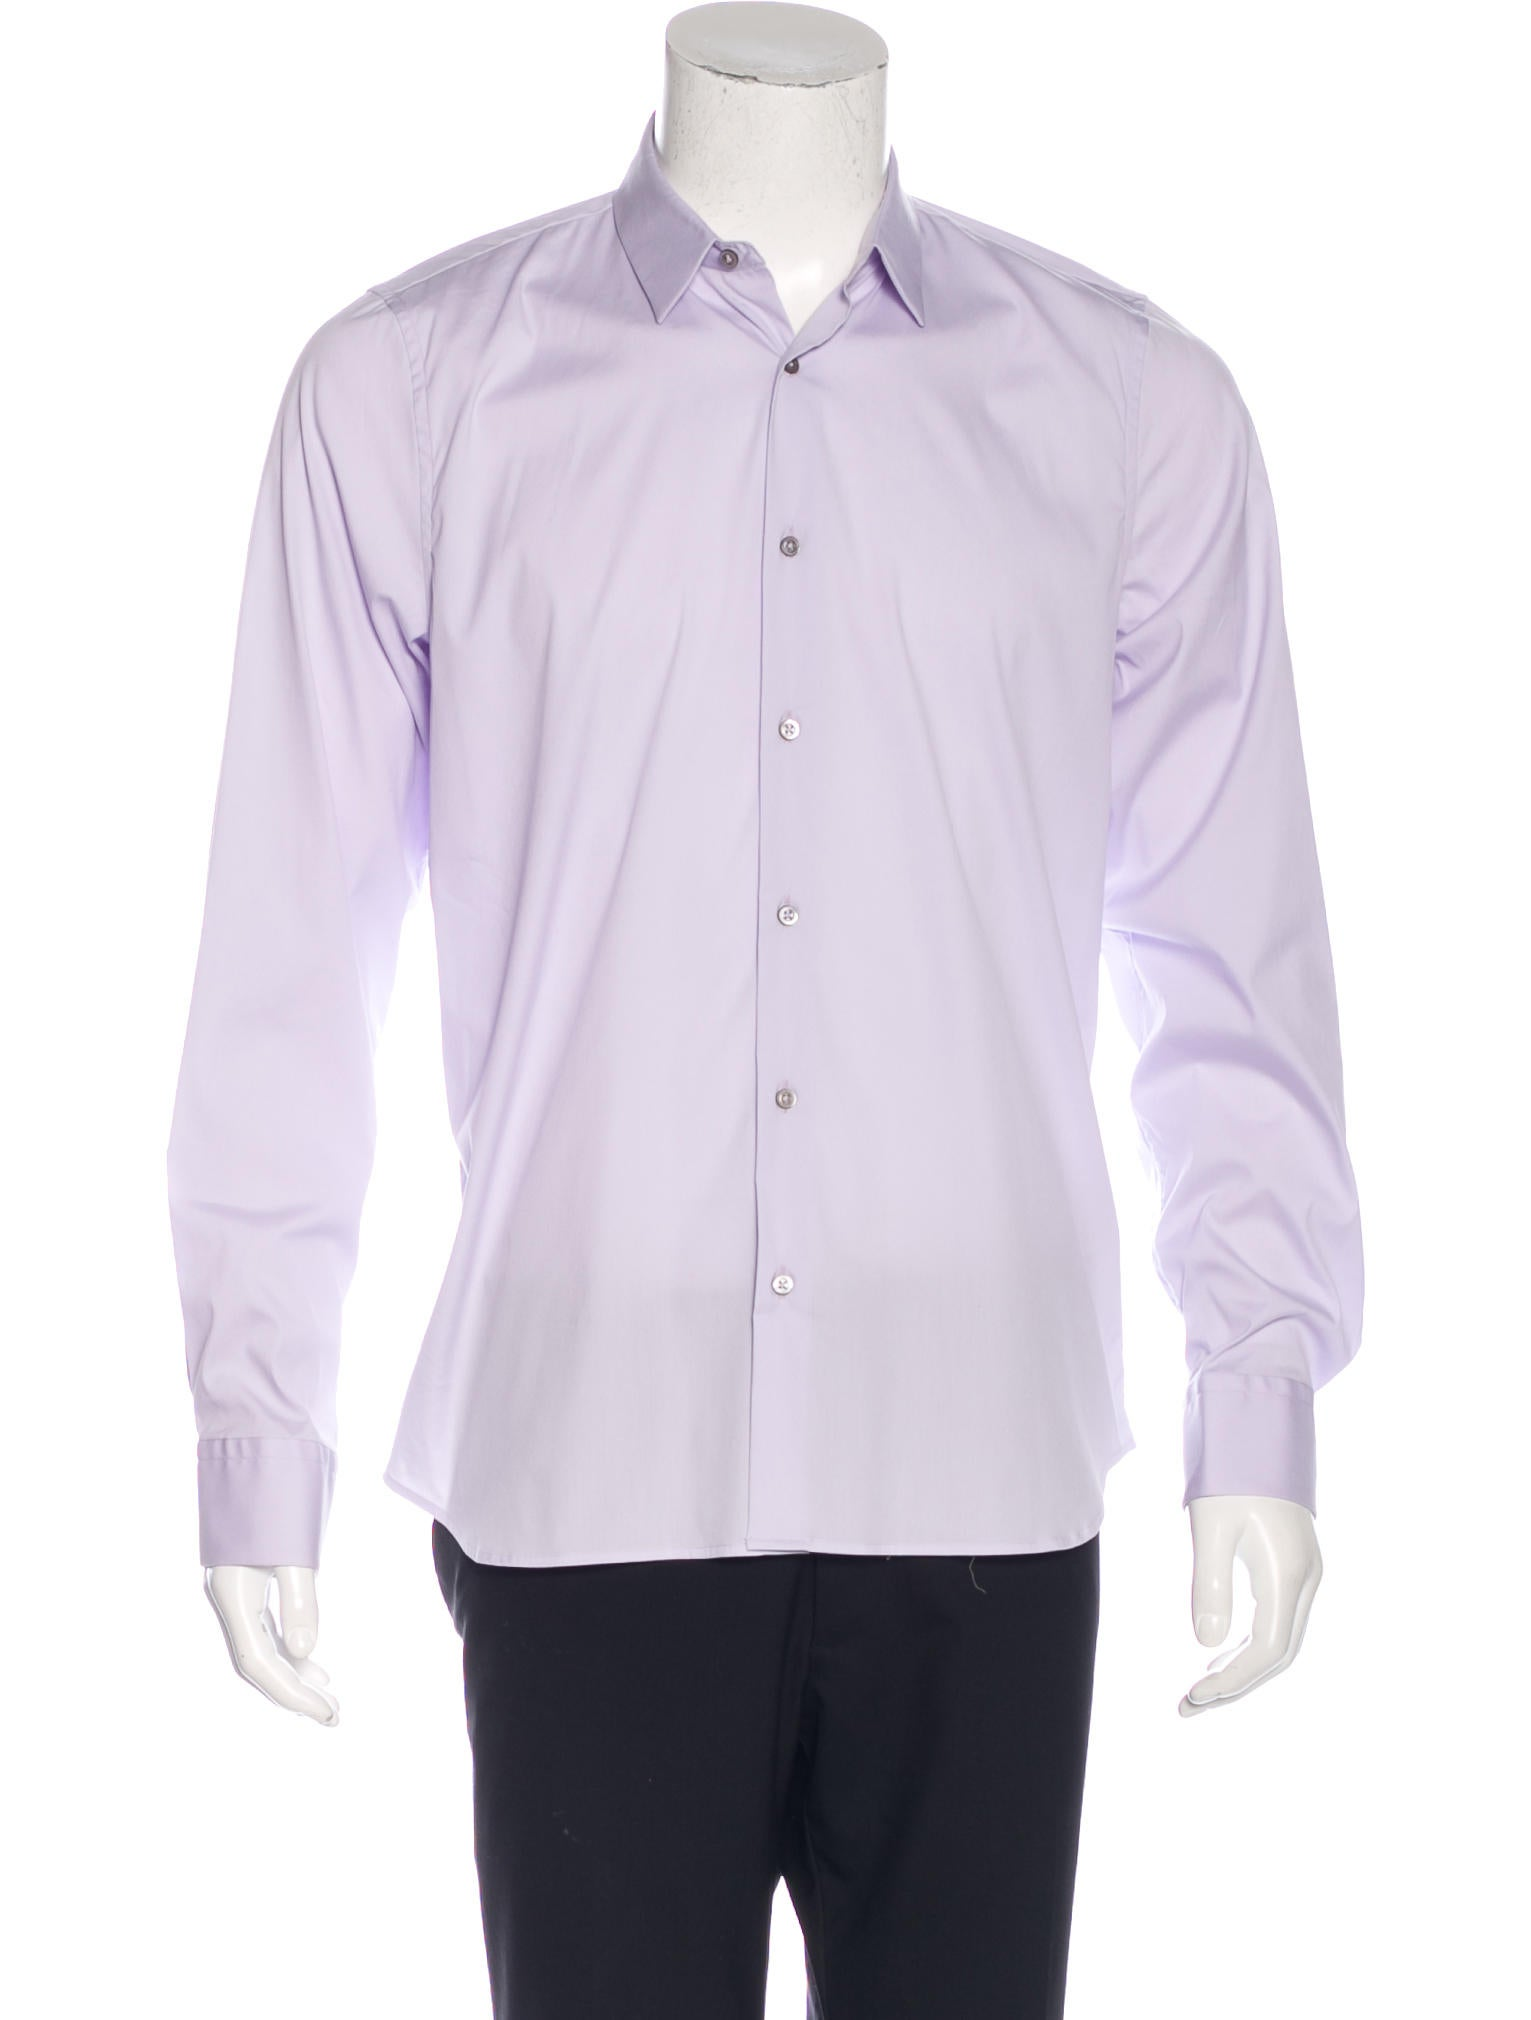 Jil sander woven button up shirt clothing jil37890 for Jil sander mens shirt